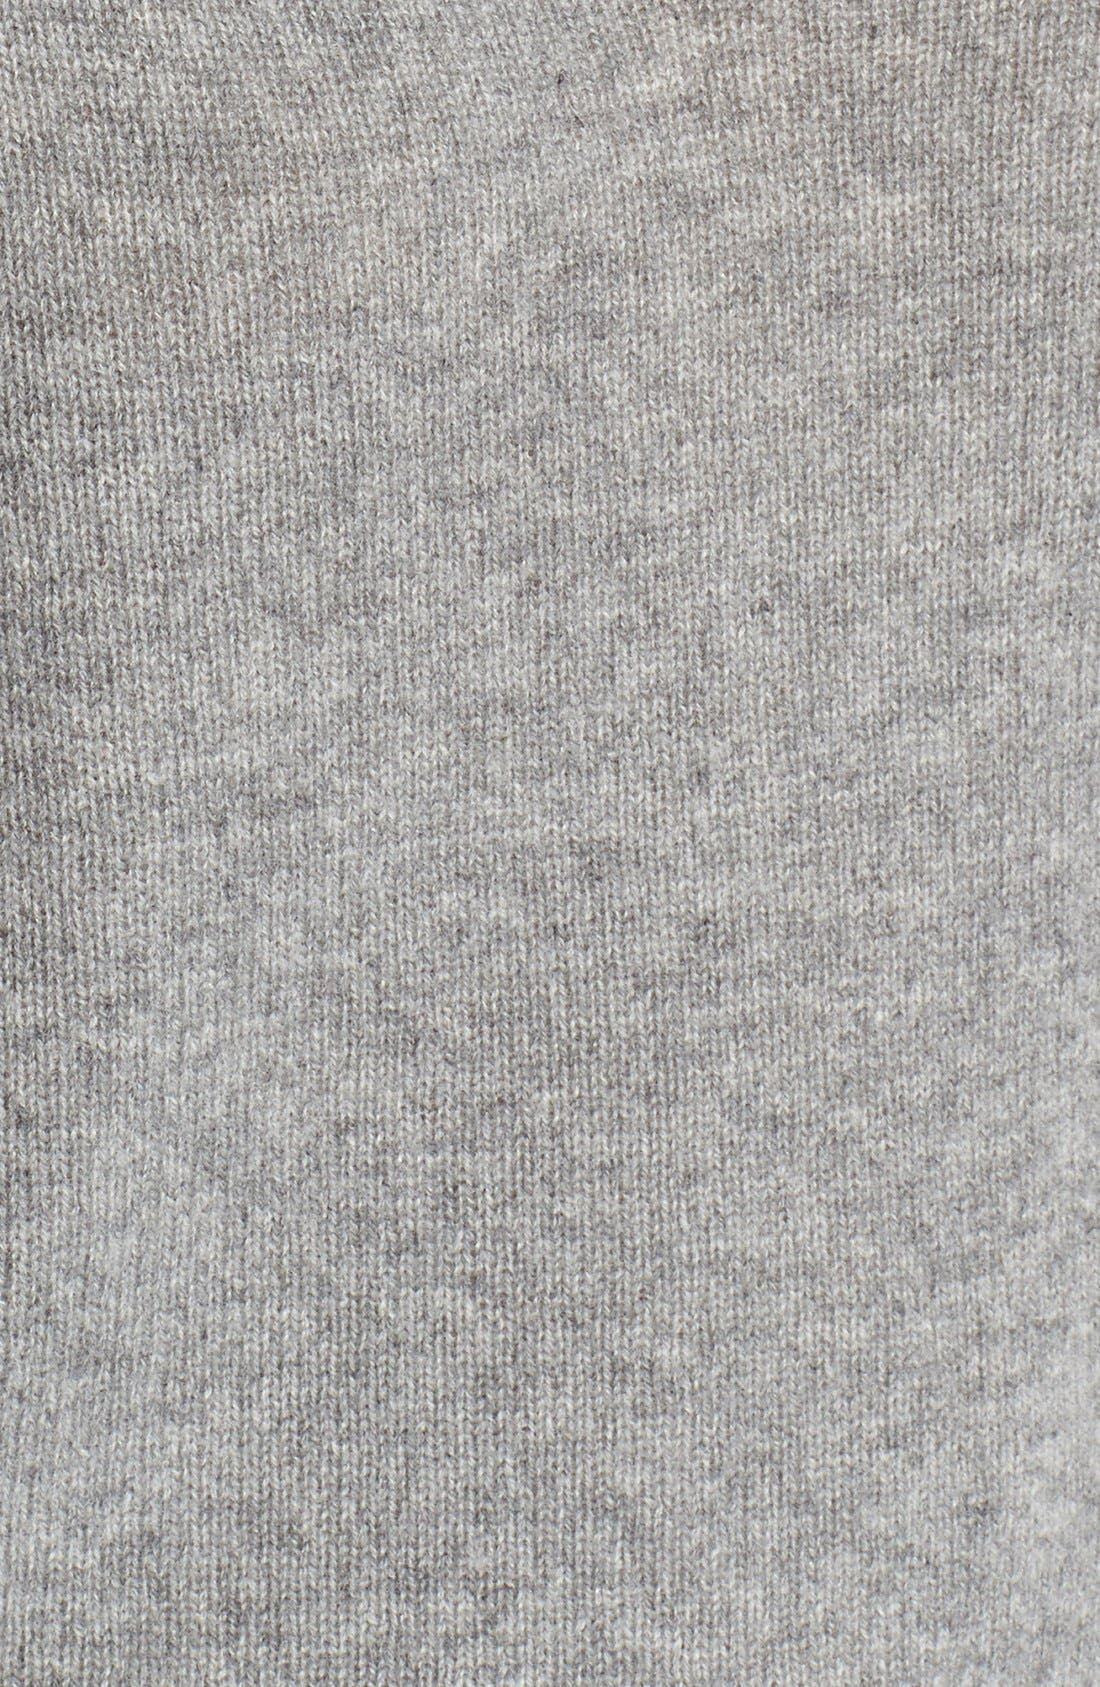 'Martin' Cashmere Crop Sweater,                             Alternate thumbnail 3, color,                             020